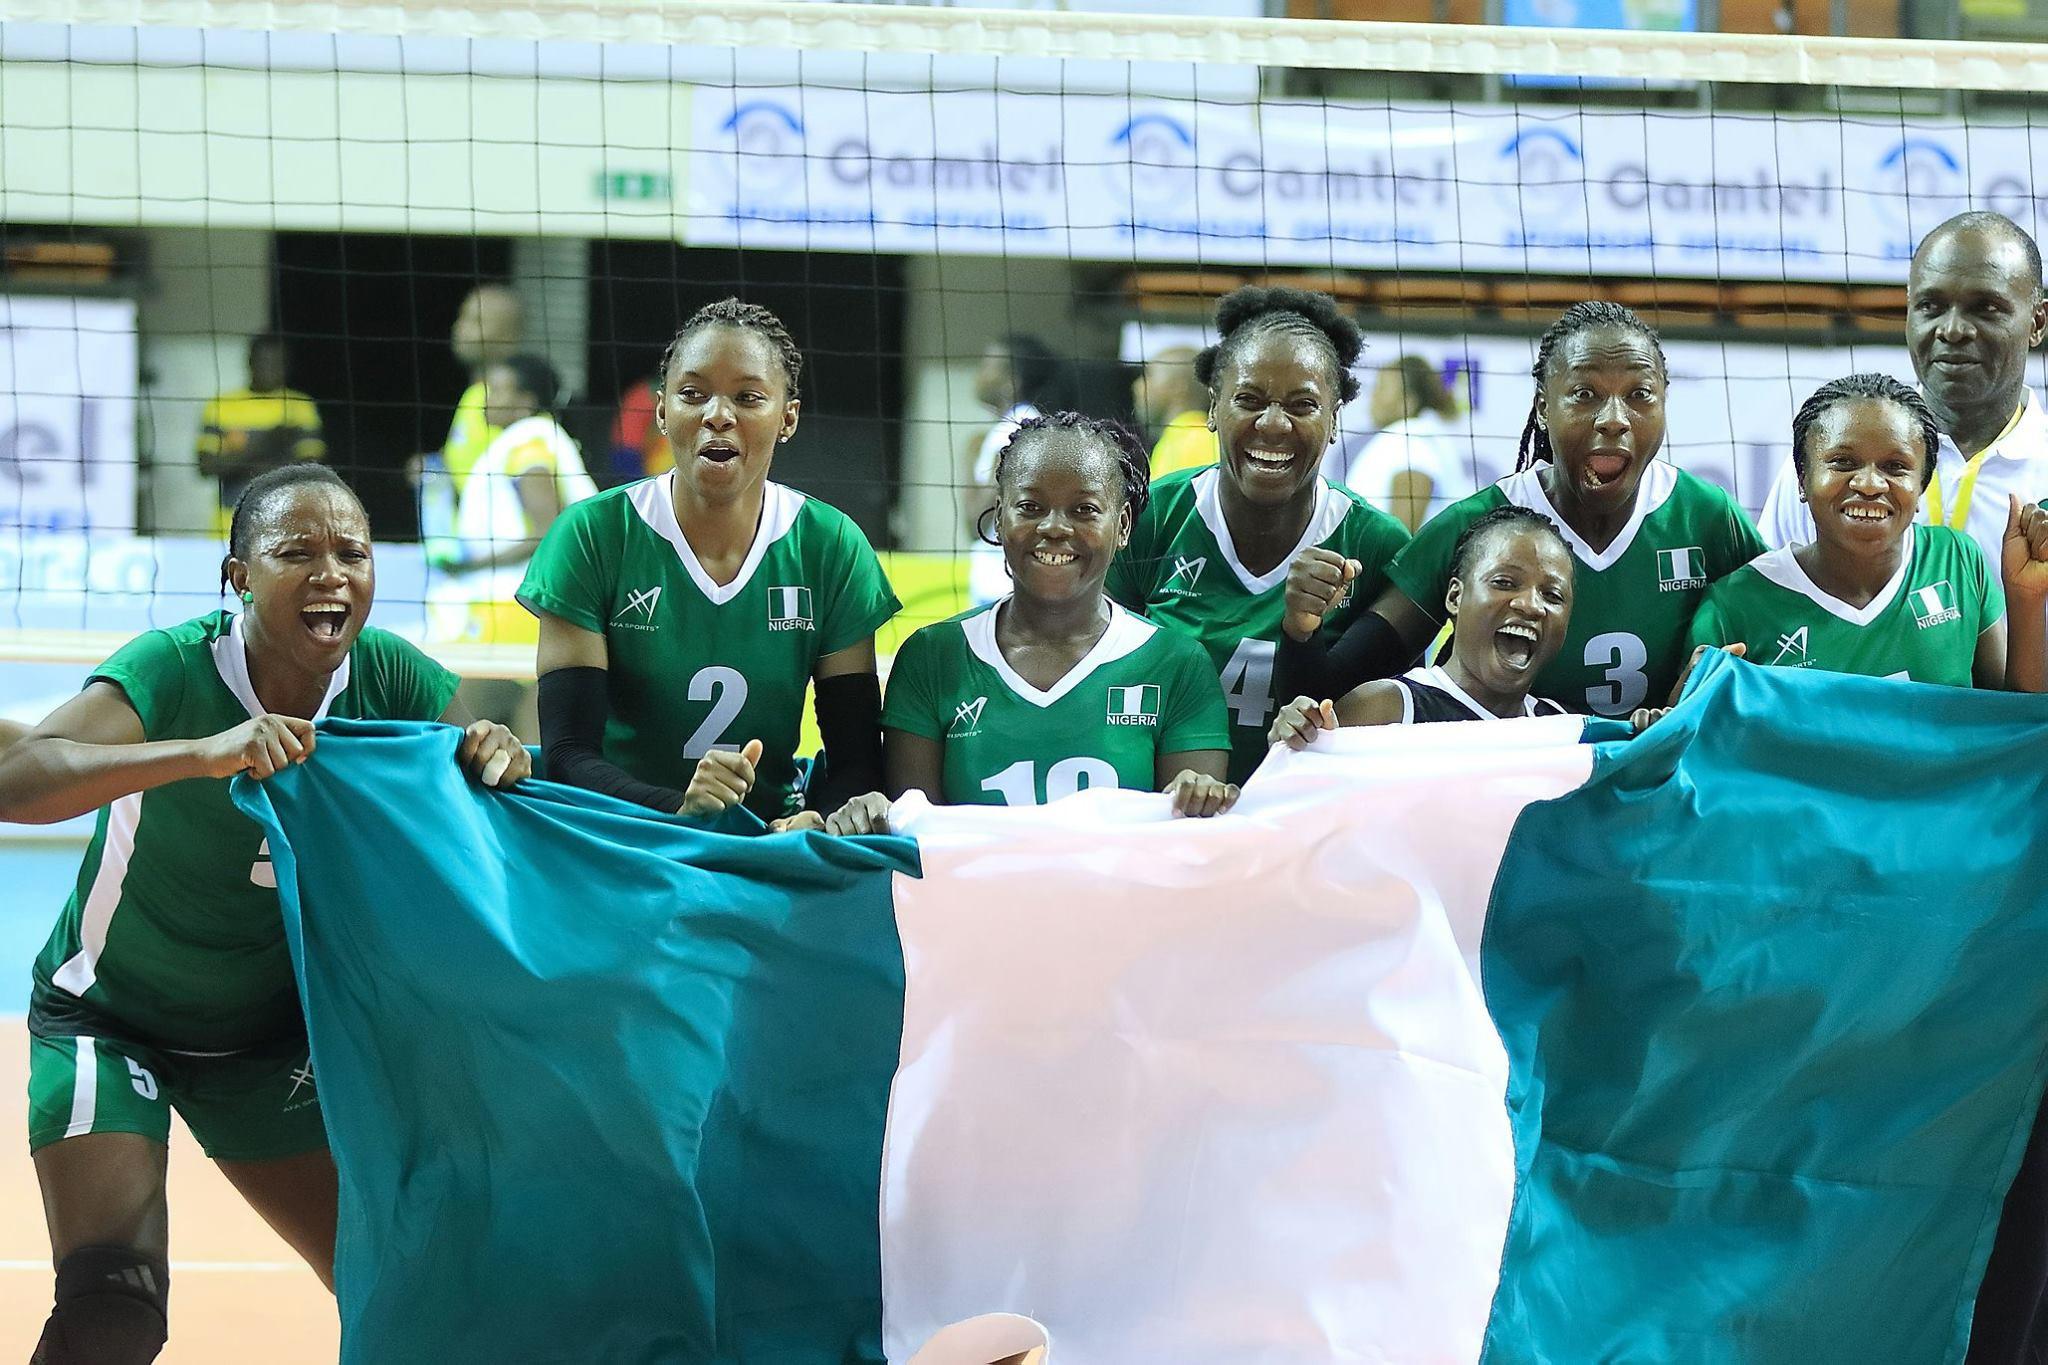 Nigeria enjoyed a comfortable victory over Democratic Republic of Congo ©CAVB